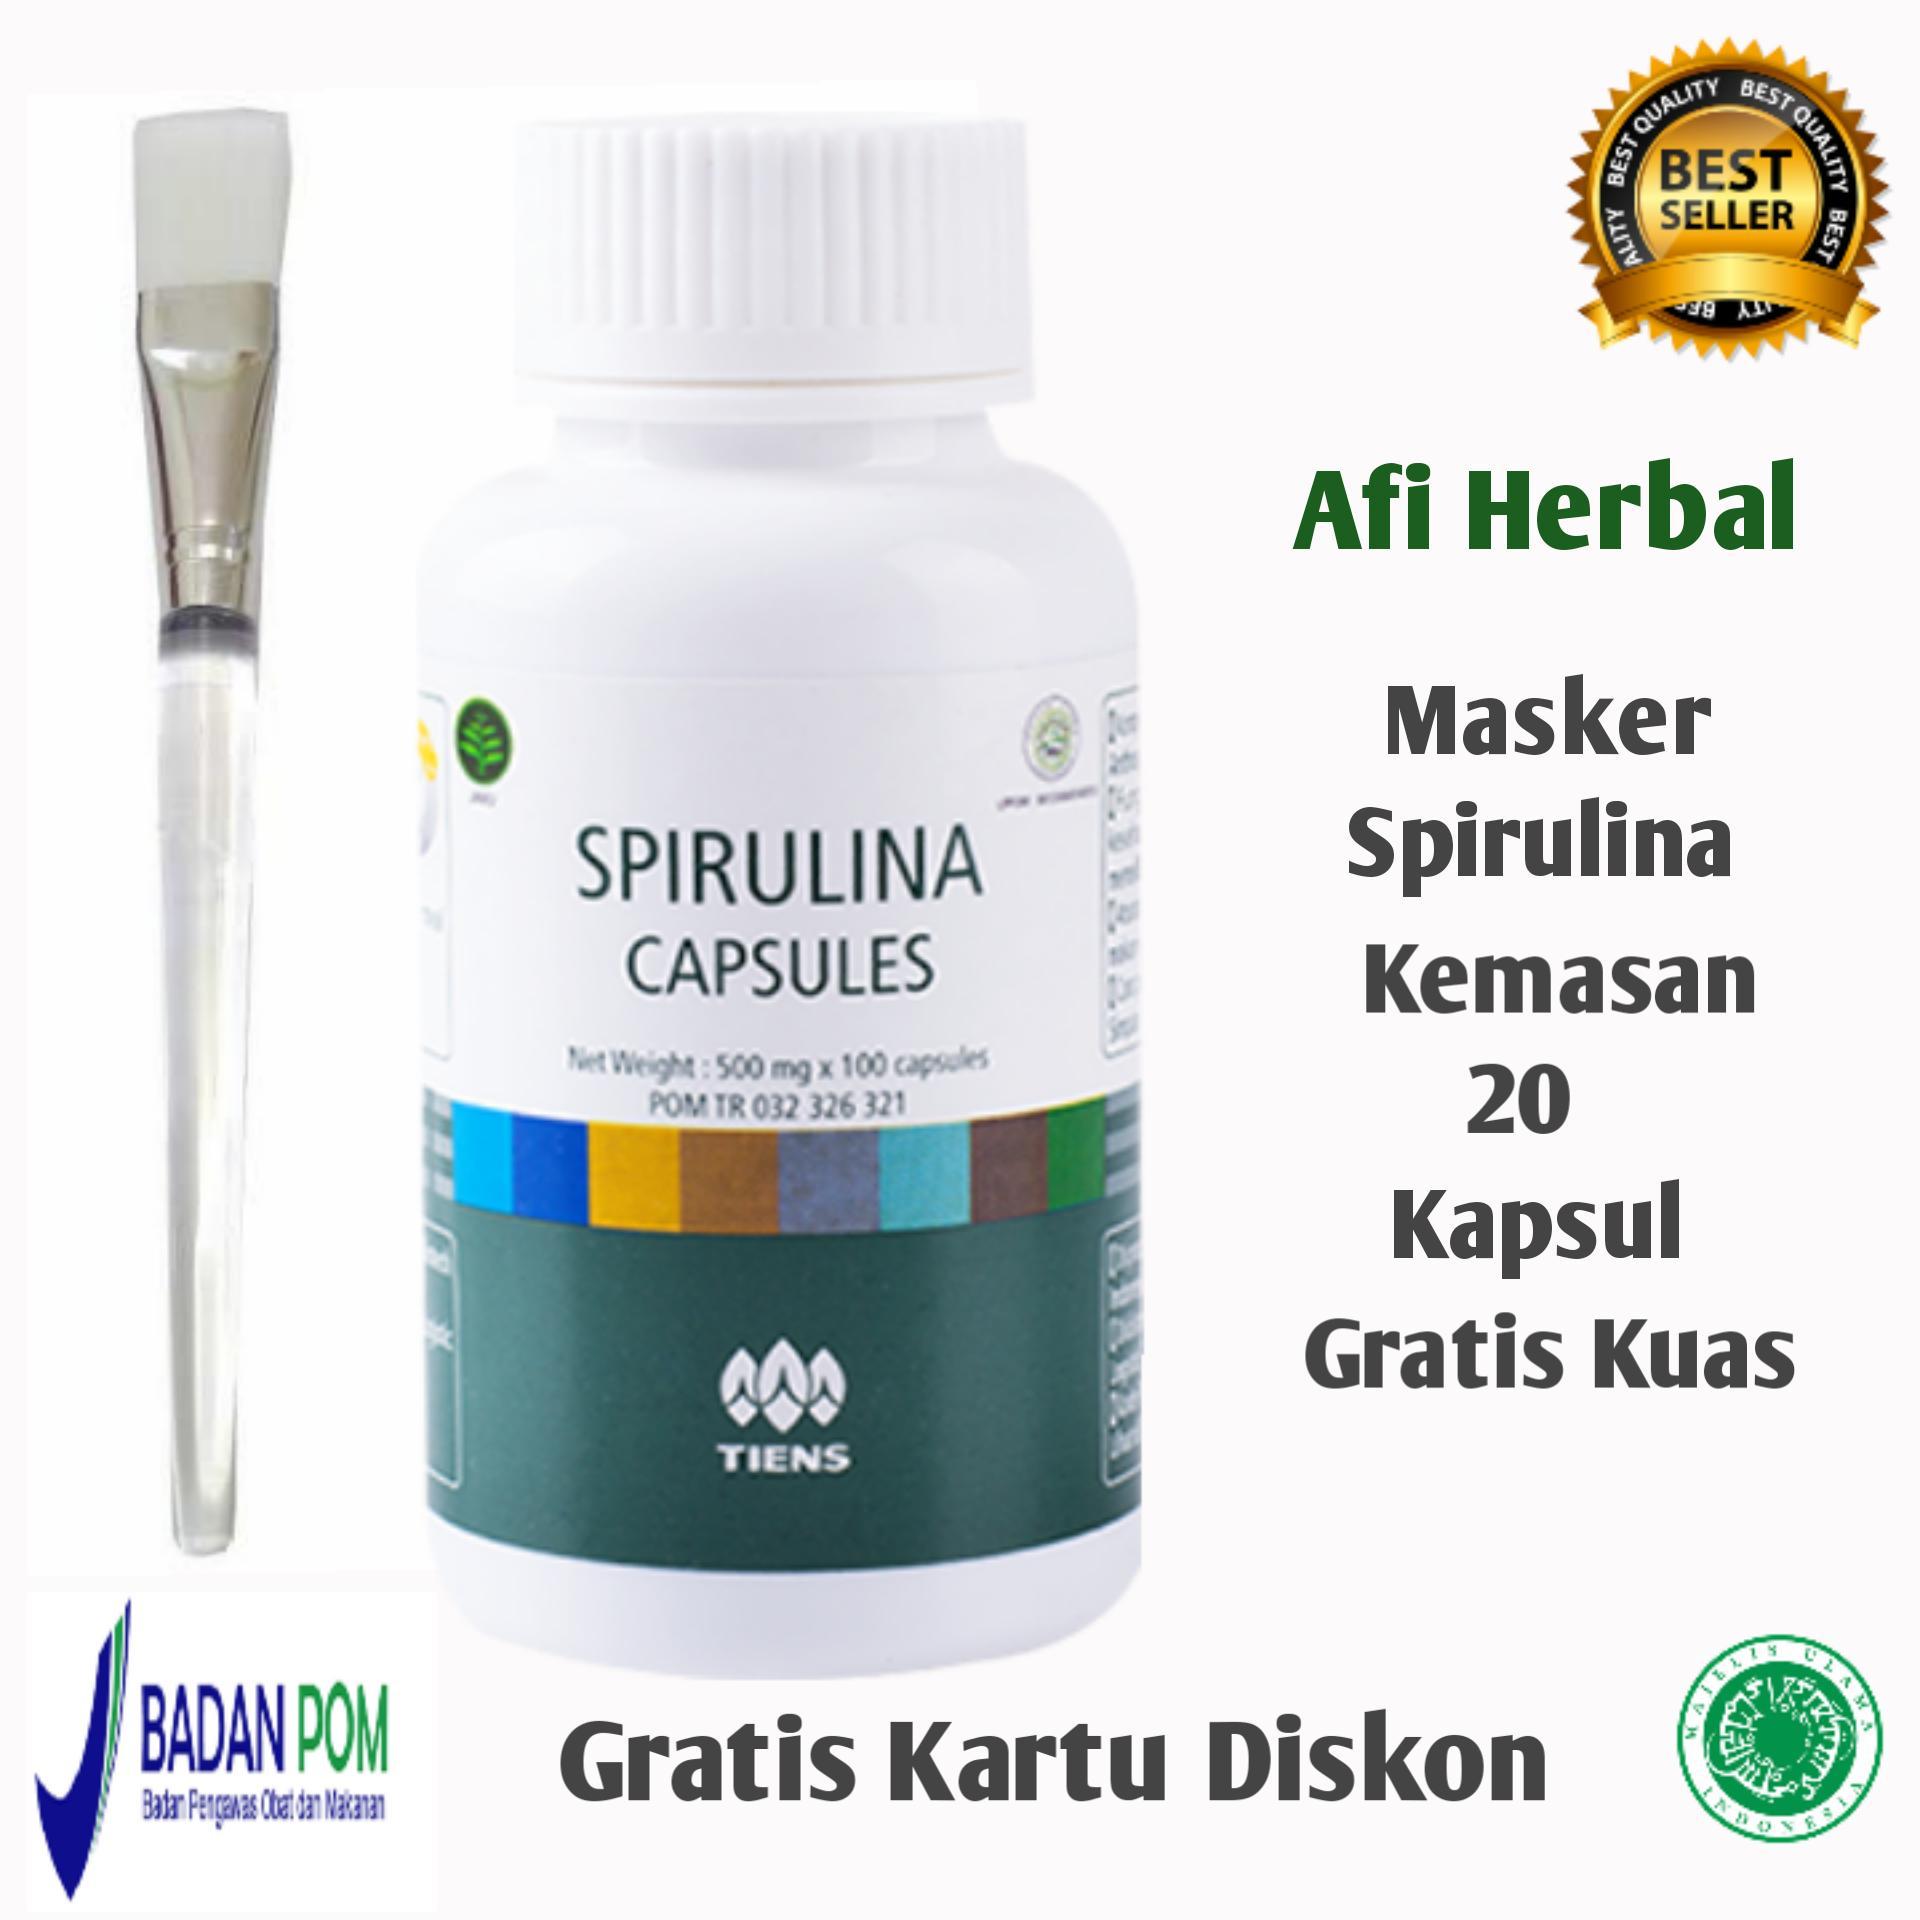 Beli Tiens Masker Spirulina Paket 20 Kapsul Free Kuas Free Member Card Afi Herbal Lengkap